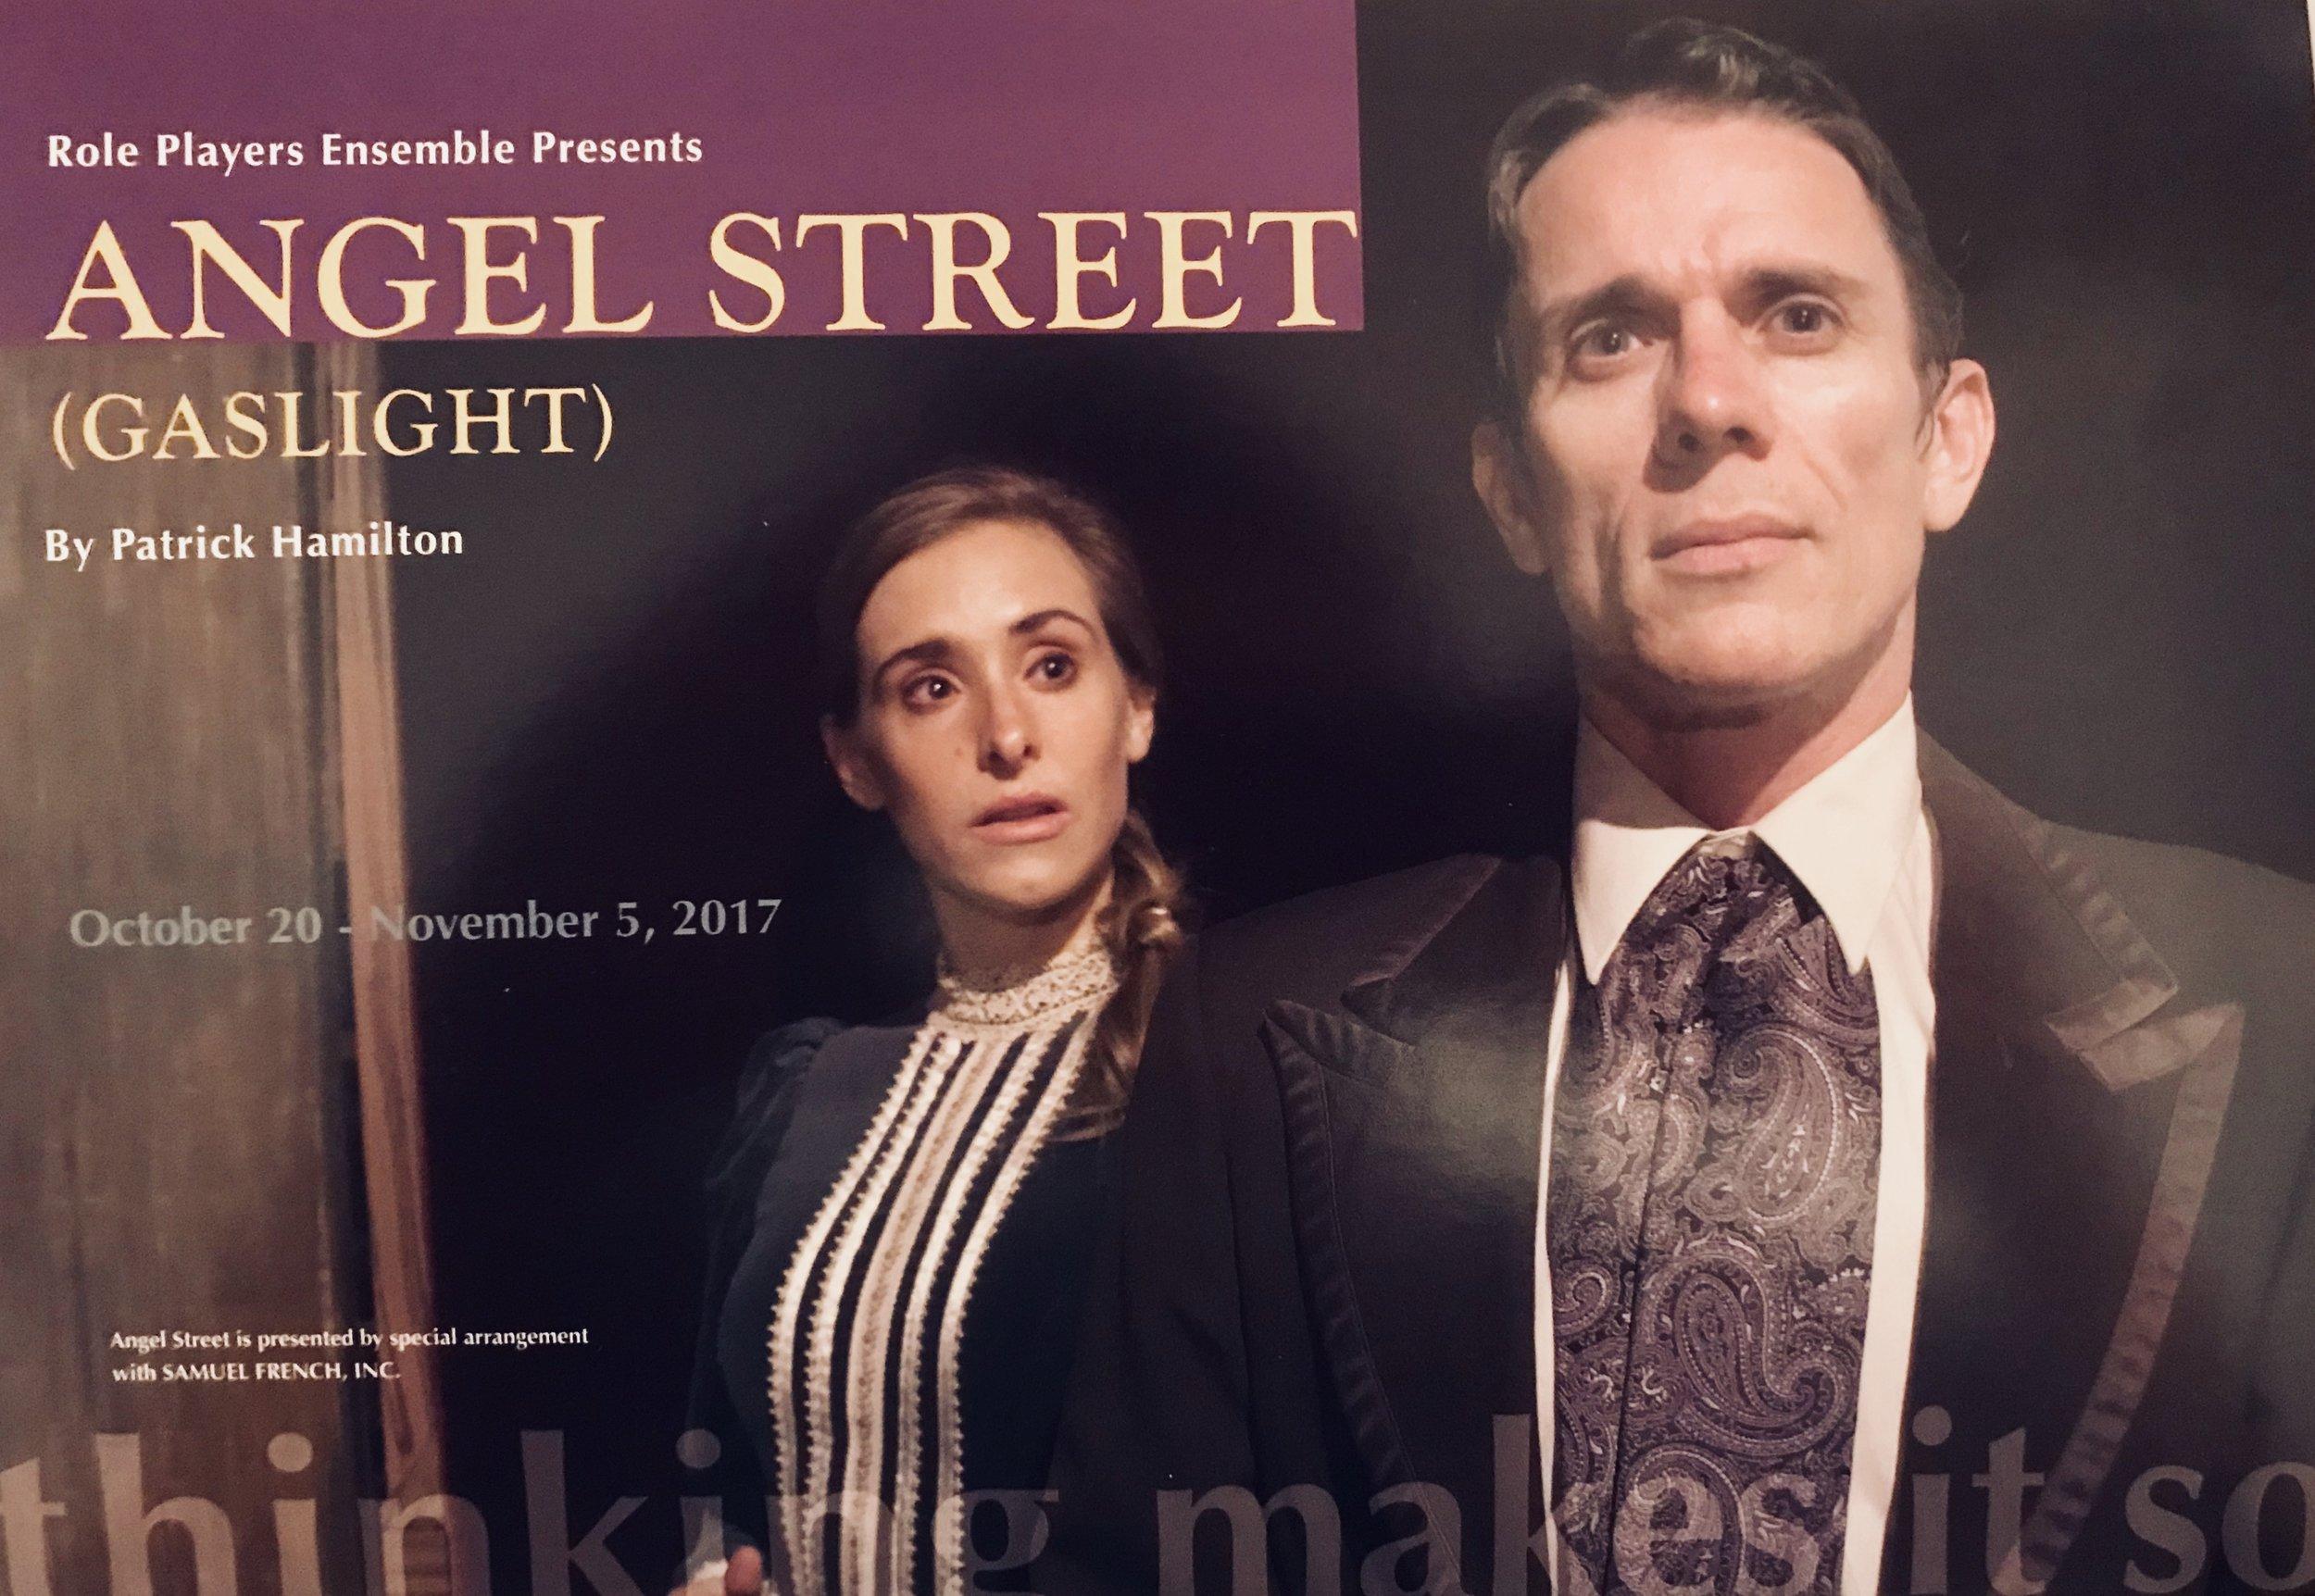 Angel Street (Gaslight) Postcard Cover